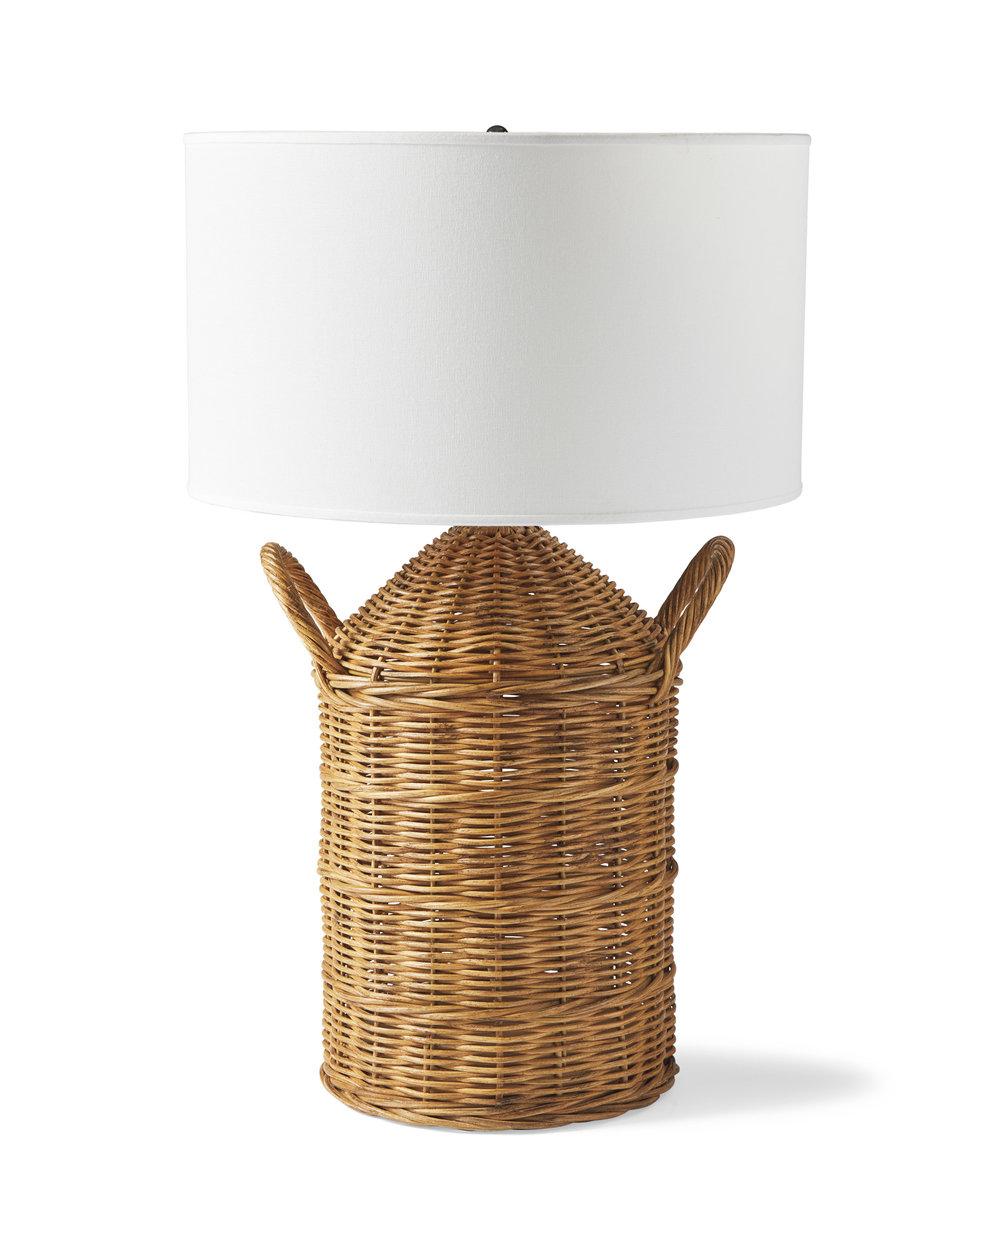 Lighting_Limantour_Table_Lamp_MV_0132_Crop_SH.jpg